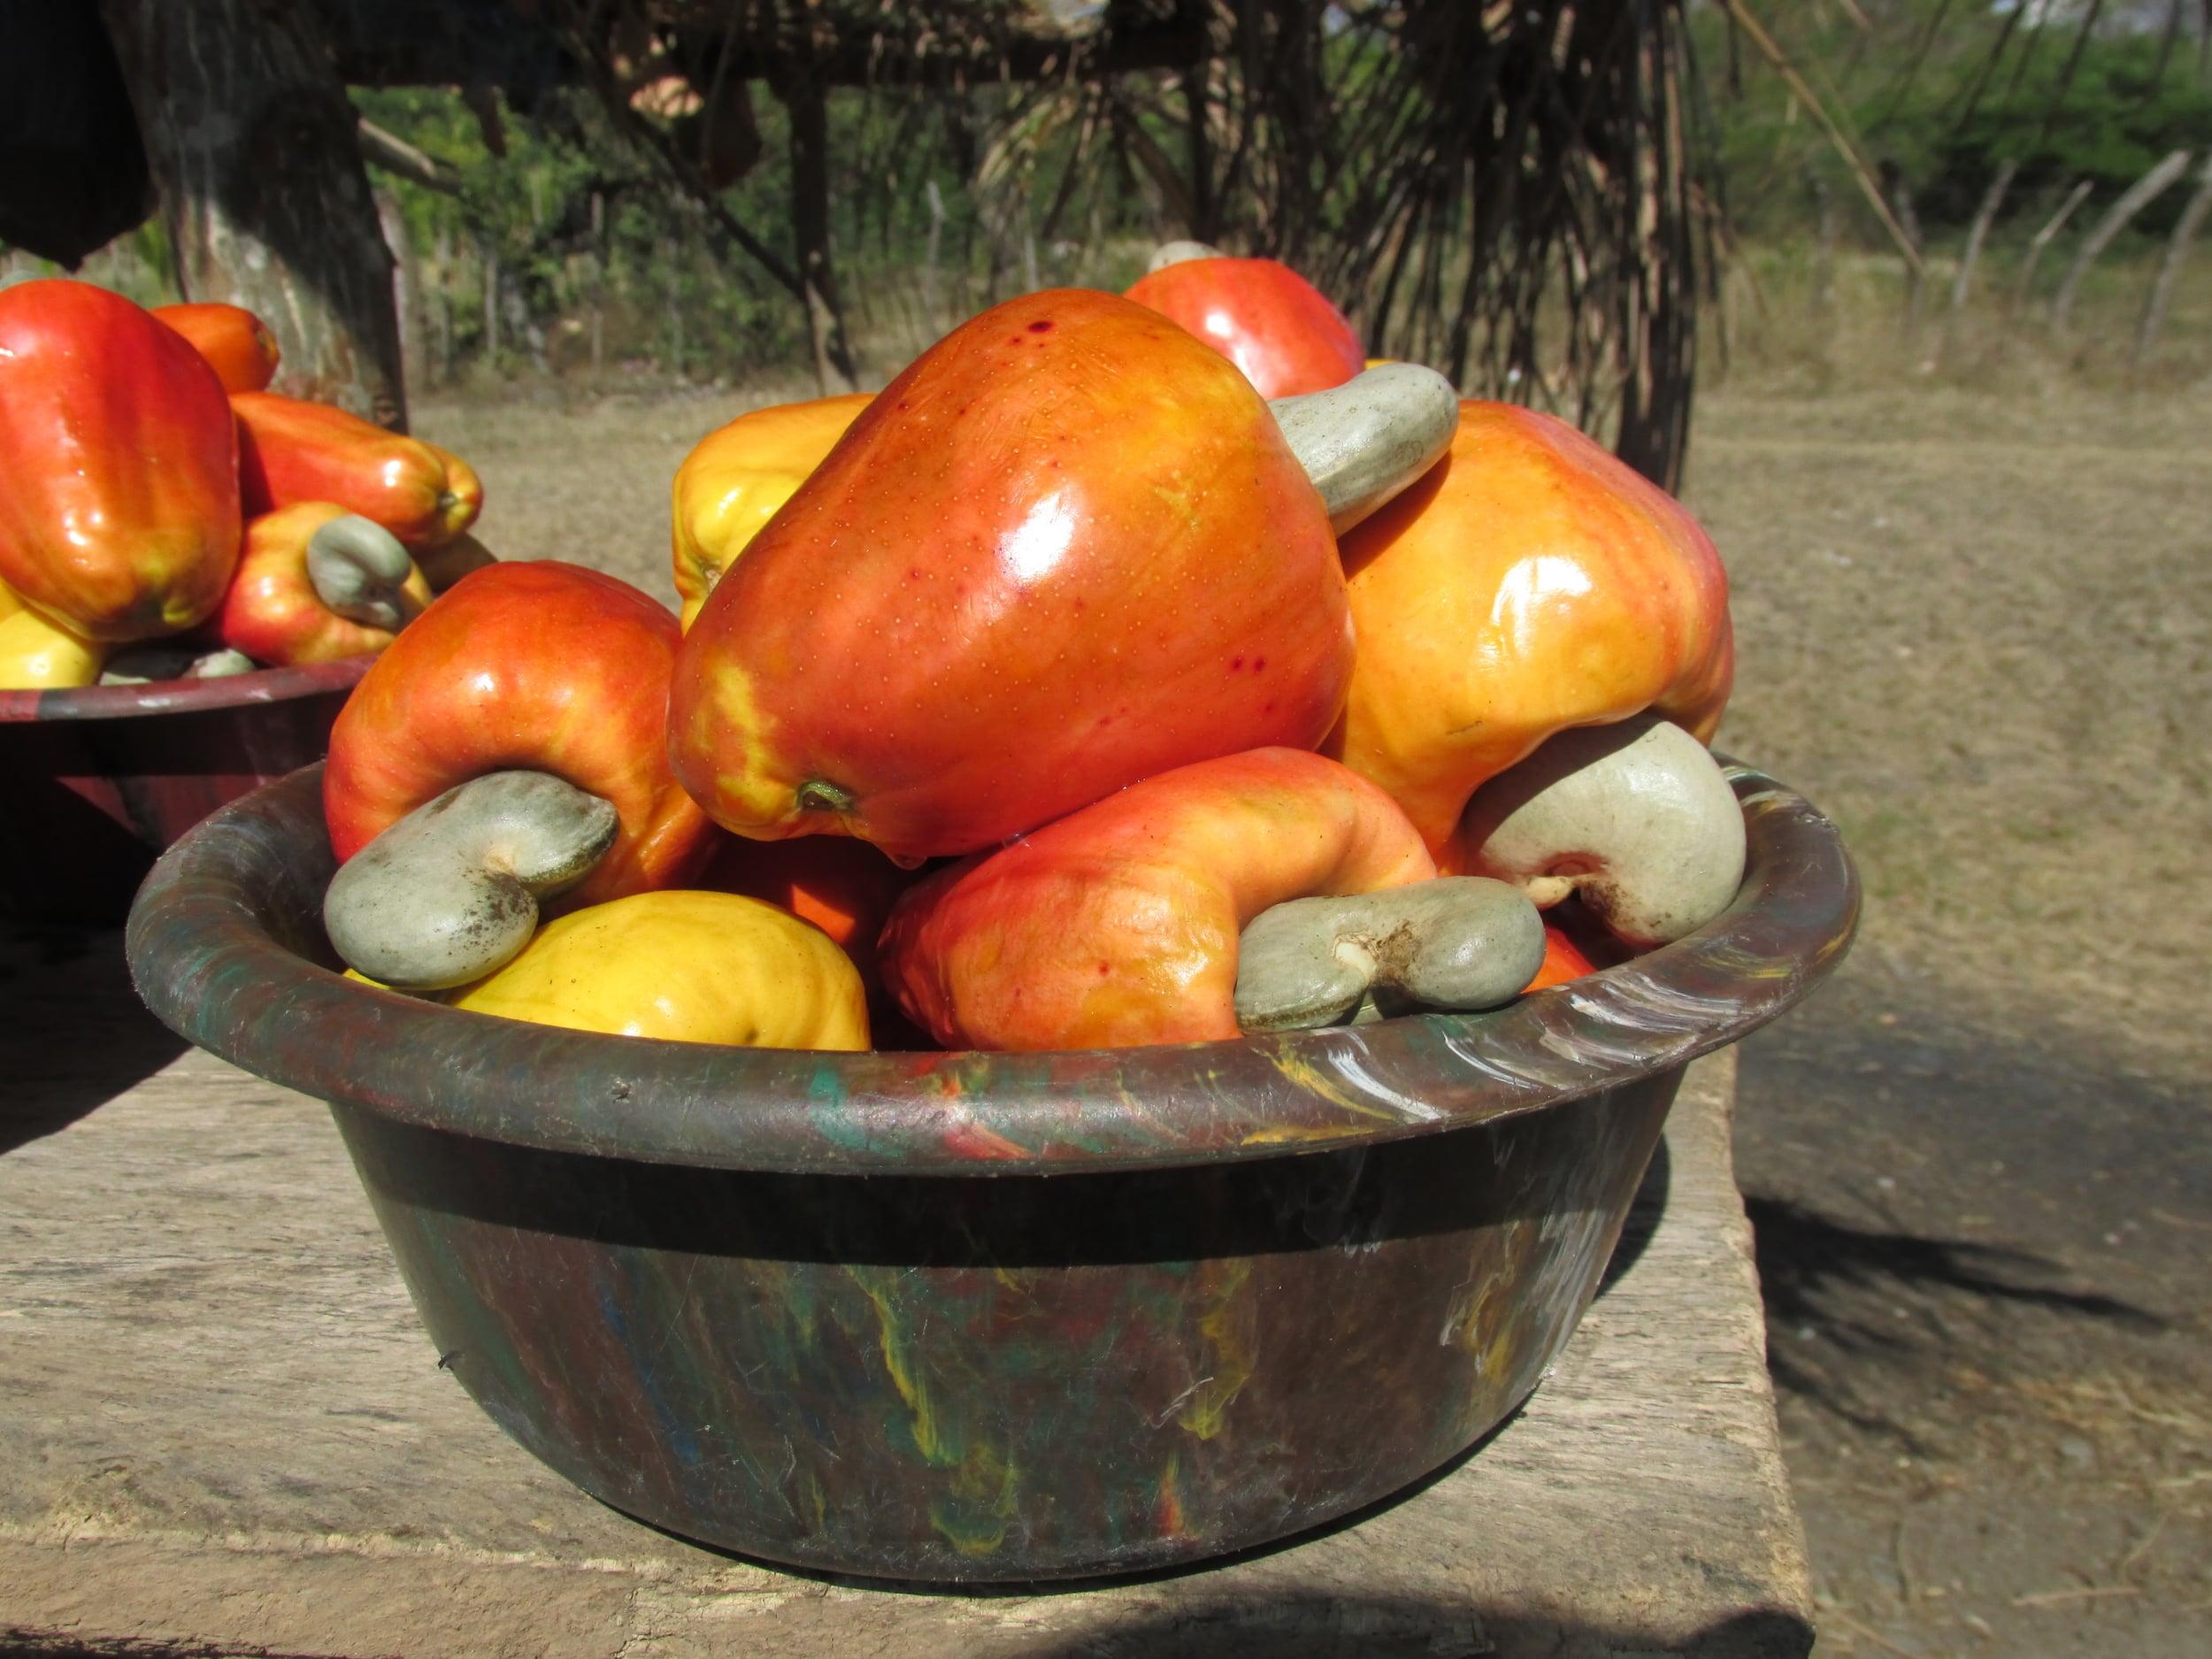 Roadside cashews. The fruits are strange but juicy.